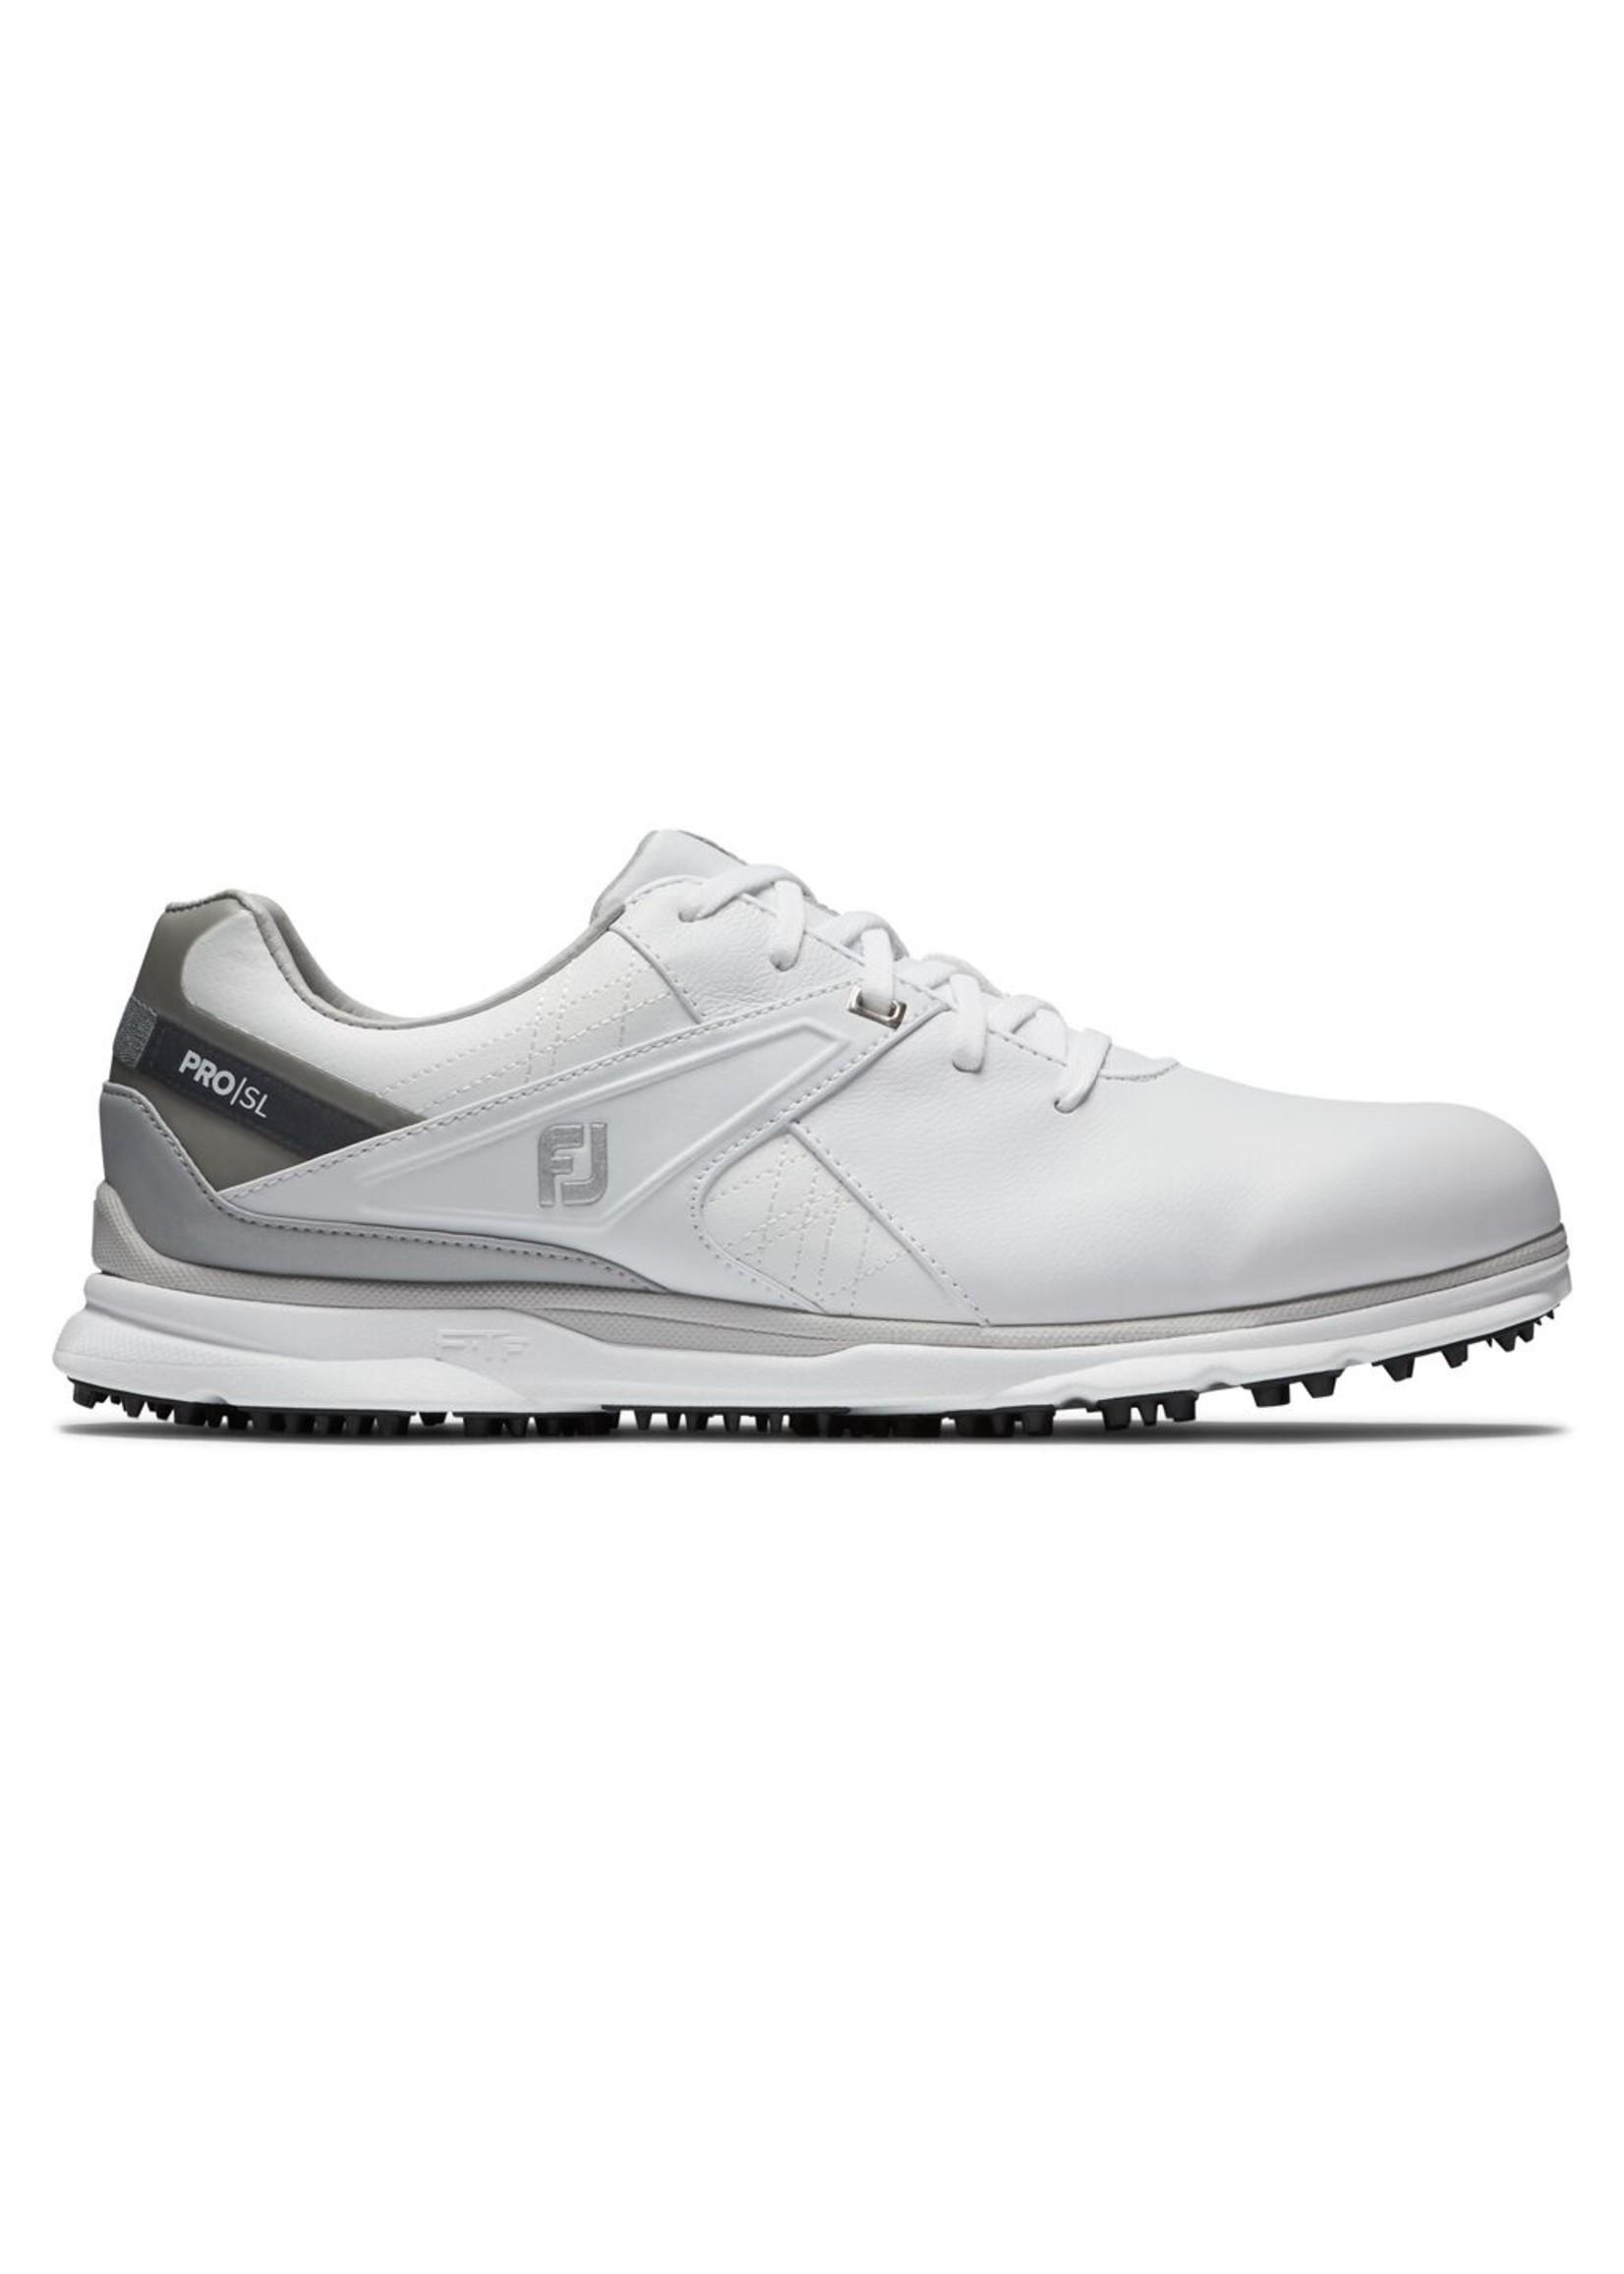 Footjoy Footjoy Pro SL Mens Golf Shoe (2020)